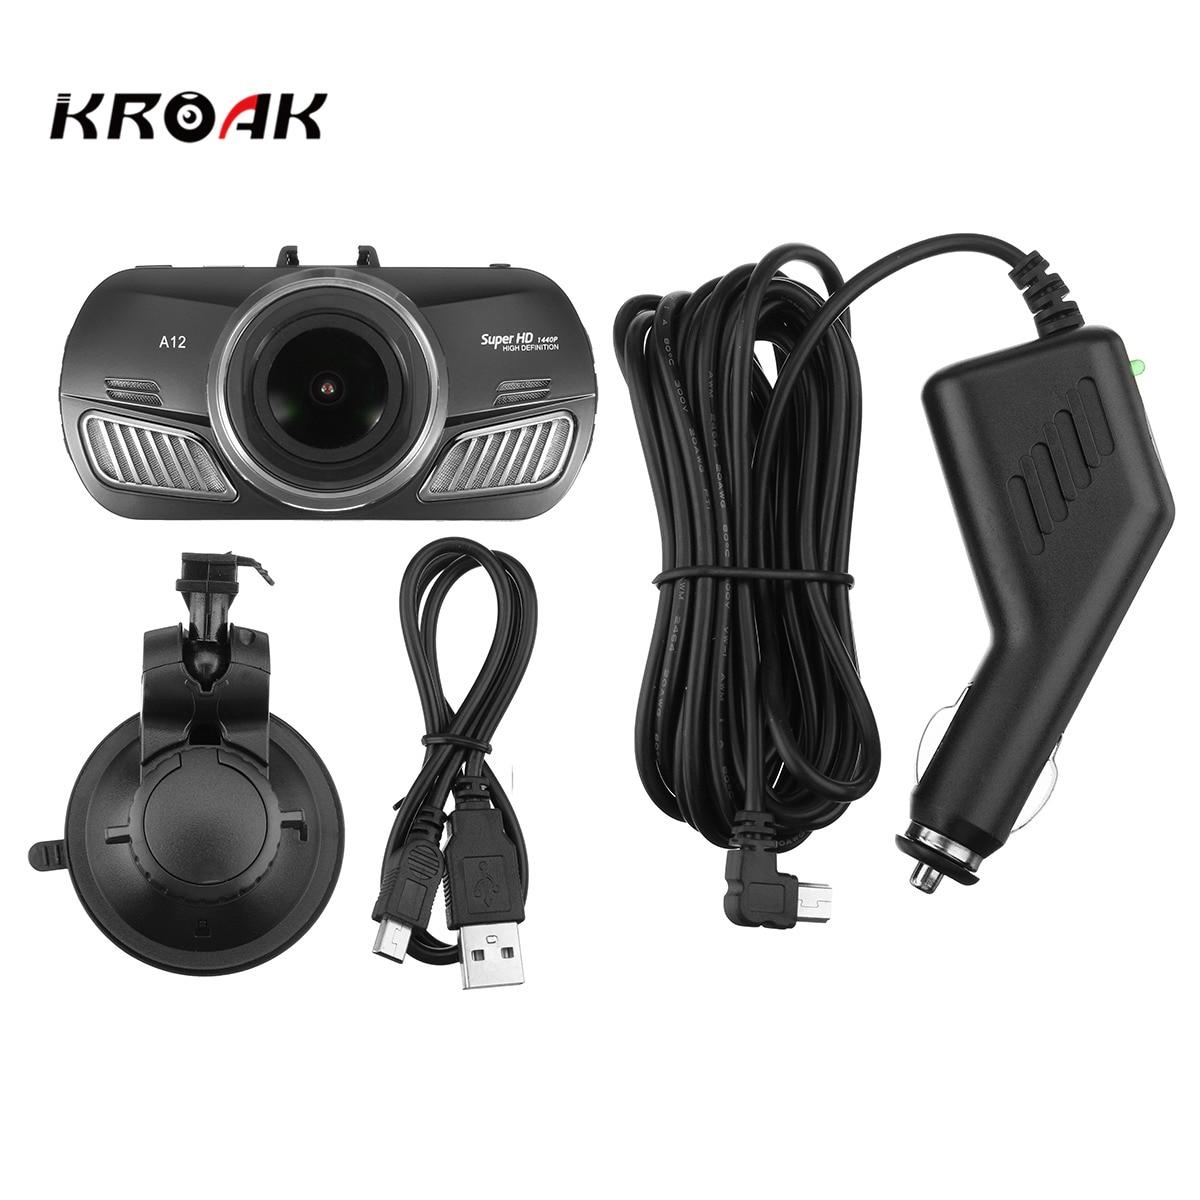 KROAK Car Vehicle HD 1440P Mini DVR Video Recorder Camcorder G-Sensor Night Vision Vehicle Traveling Date Recorder